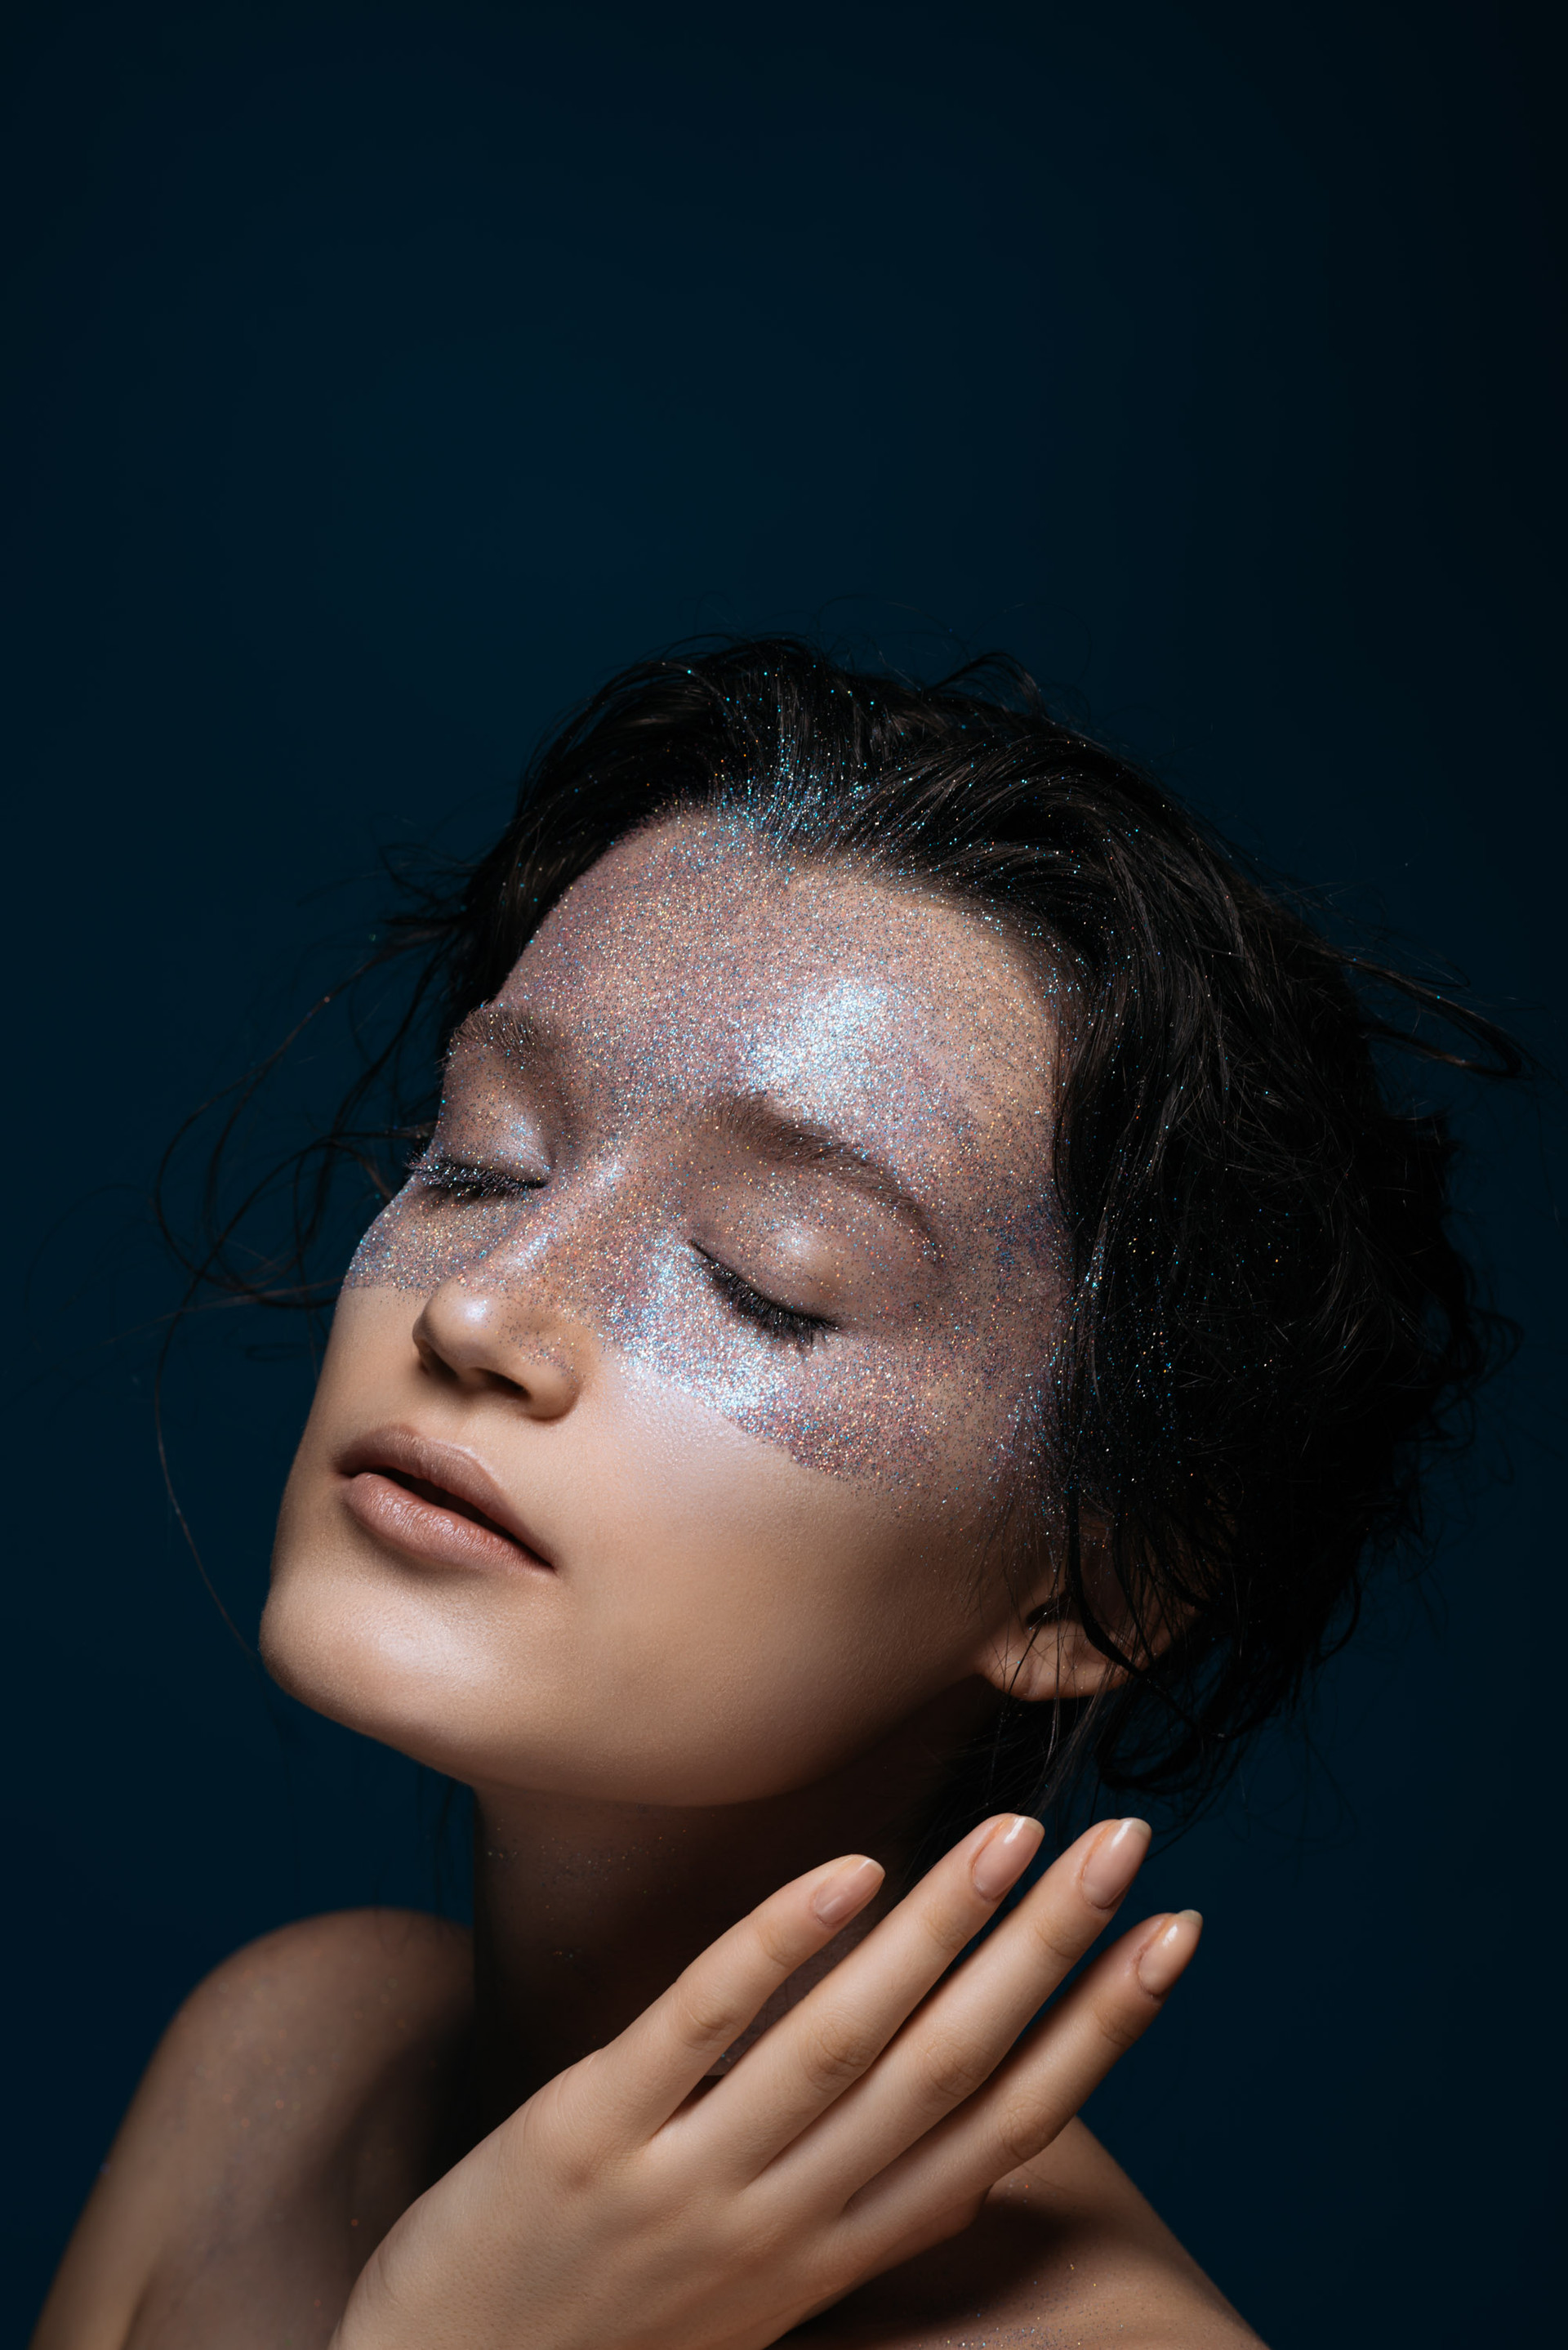 Photographer: Antonio del Rosario Hairstylist: Mong Amado Model: Karina Babii of Women's Folio